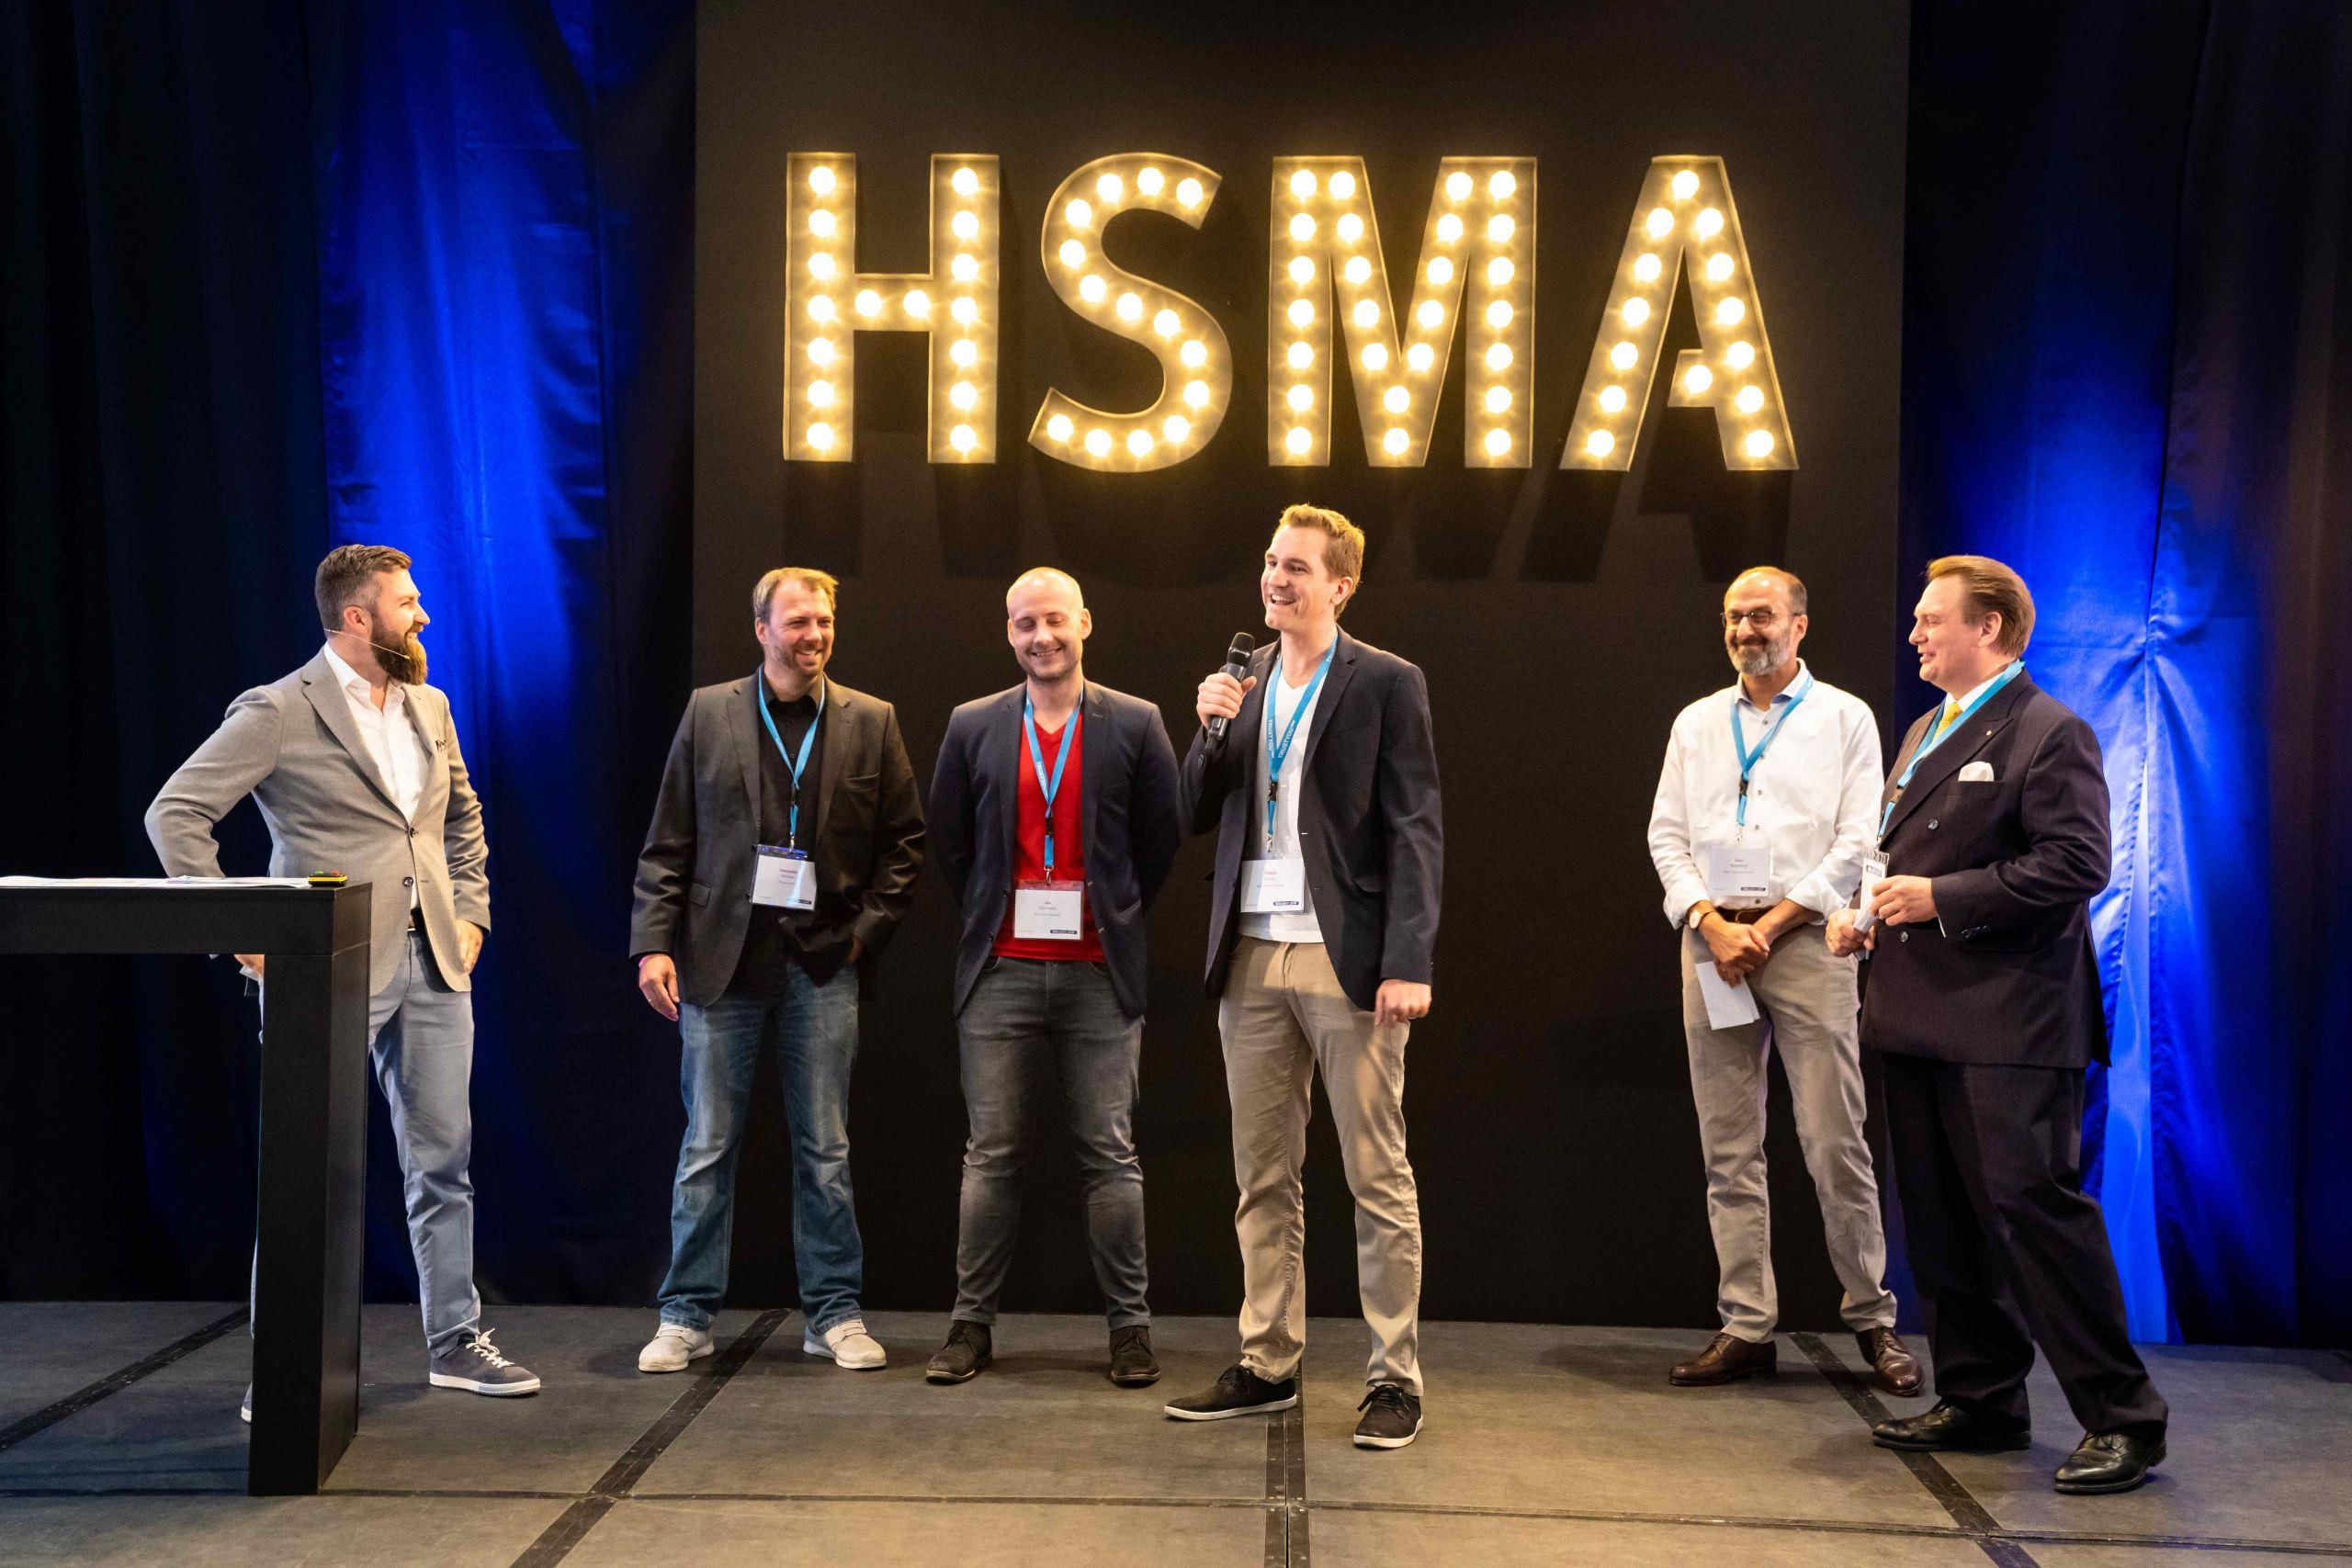 HSMA e Day 2018